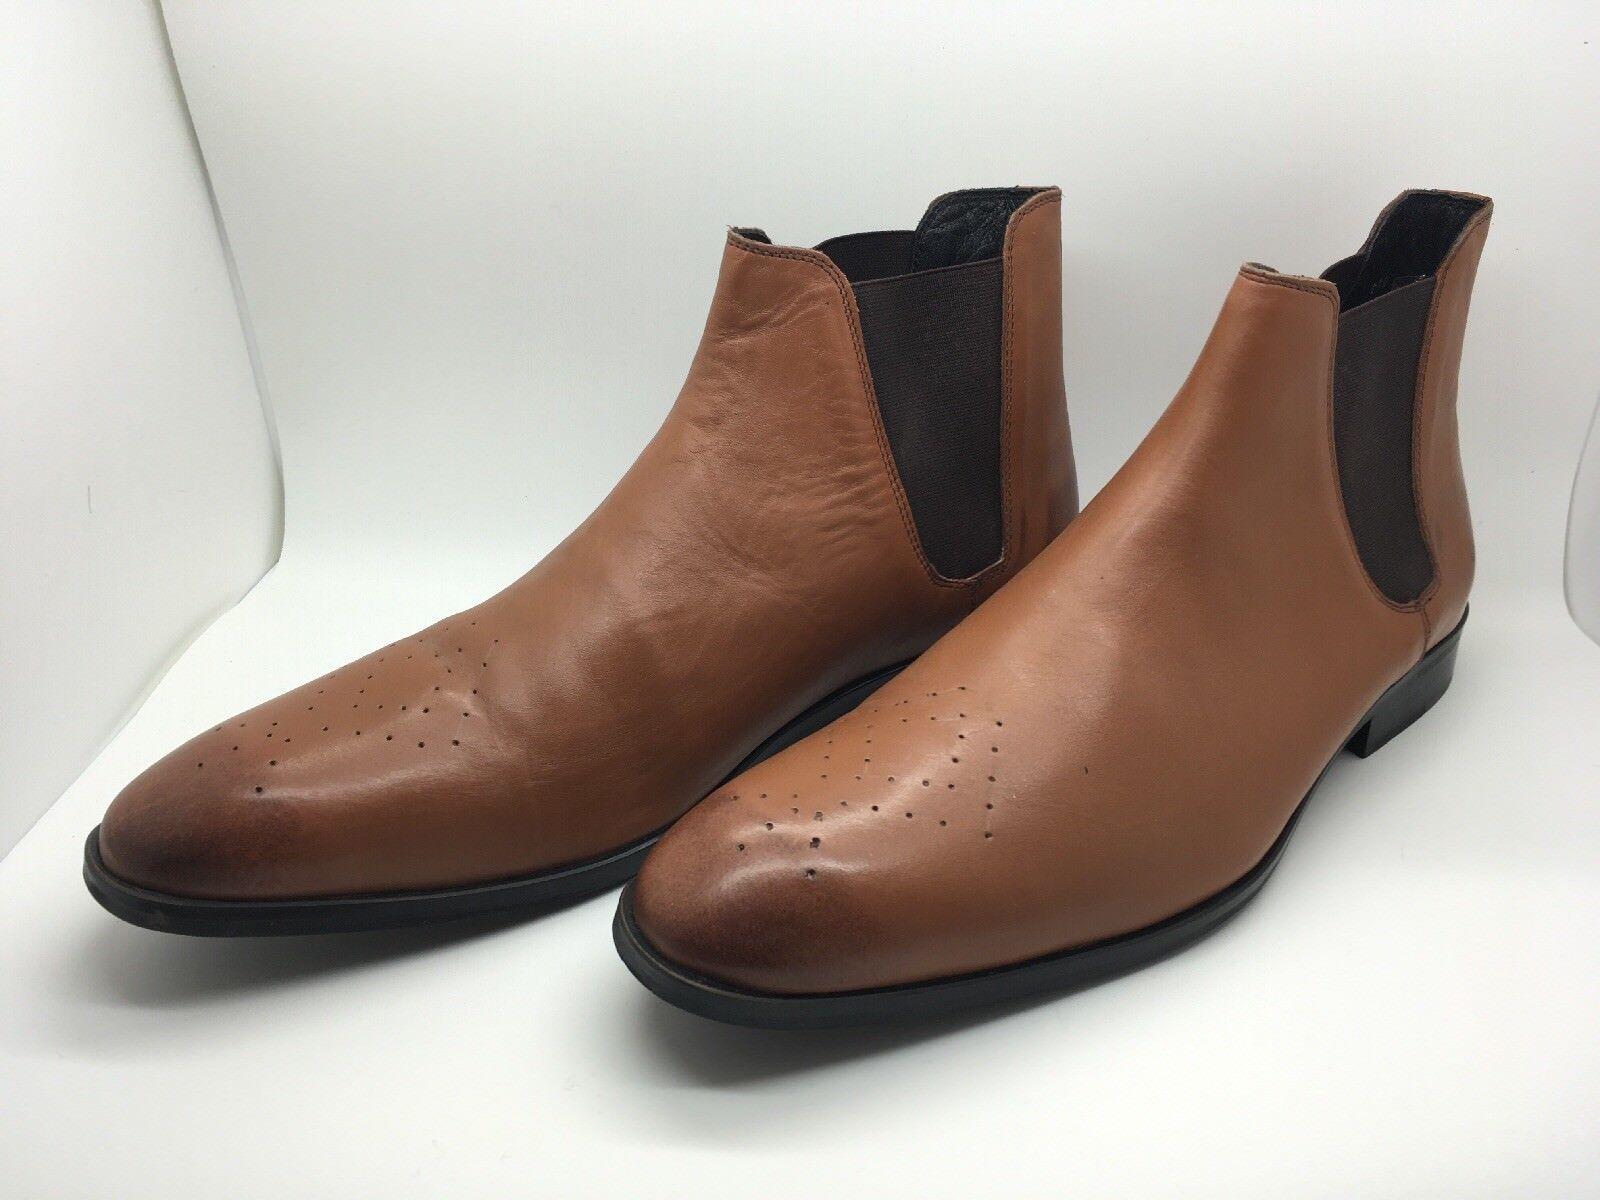 Hohe Schuhe neu Herren VERTIGO Leder braun neu Schuhe Größe 44 eur / 10 US 82e313